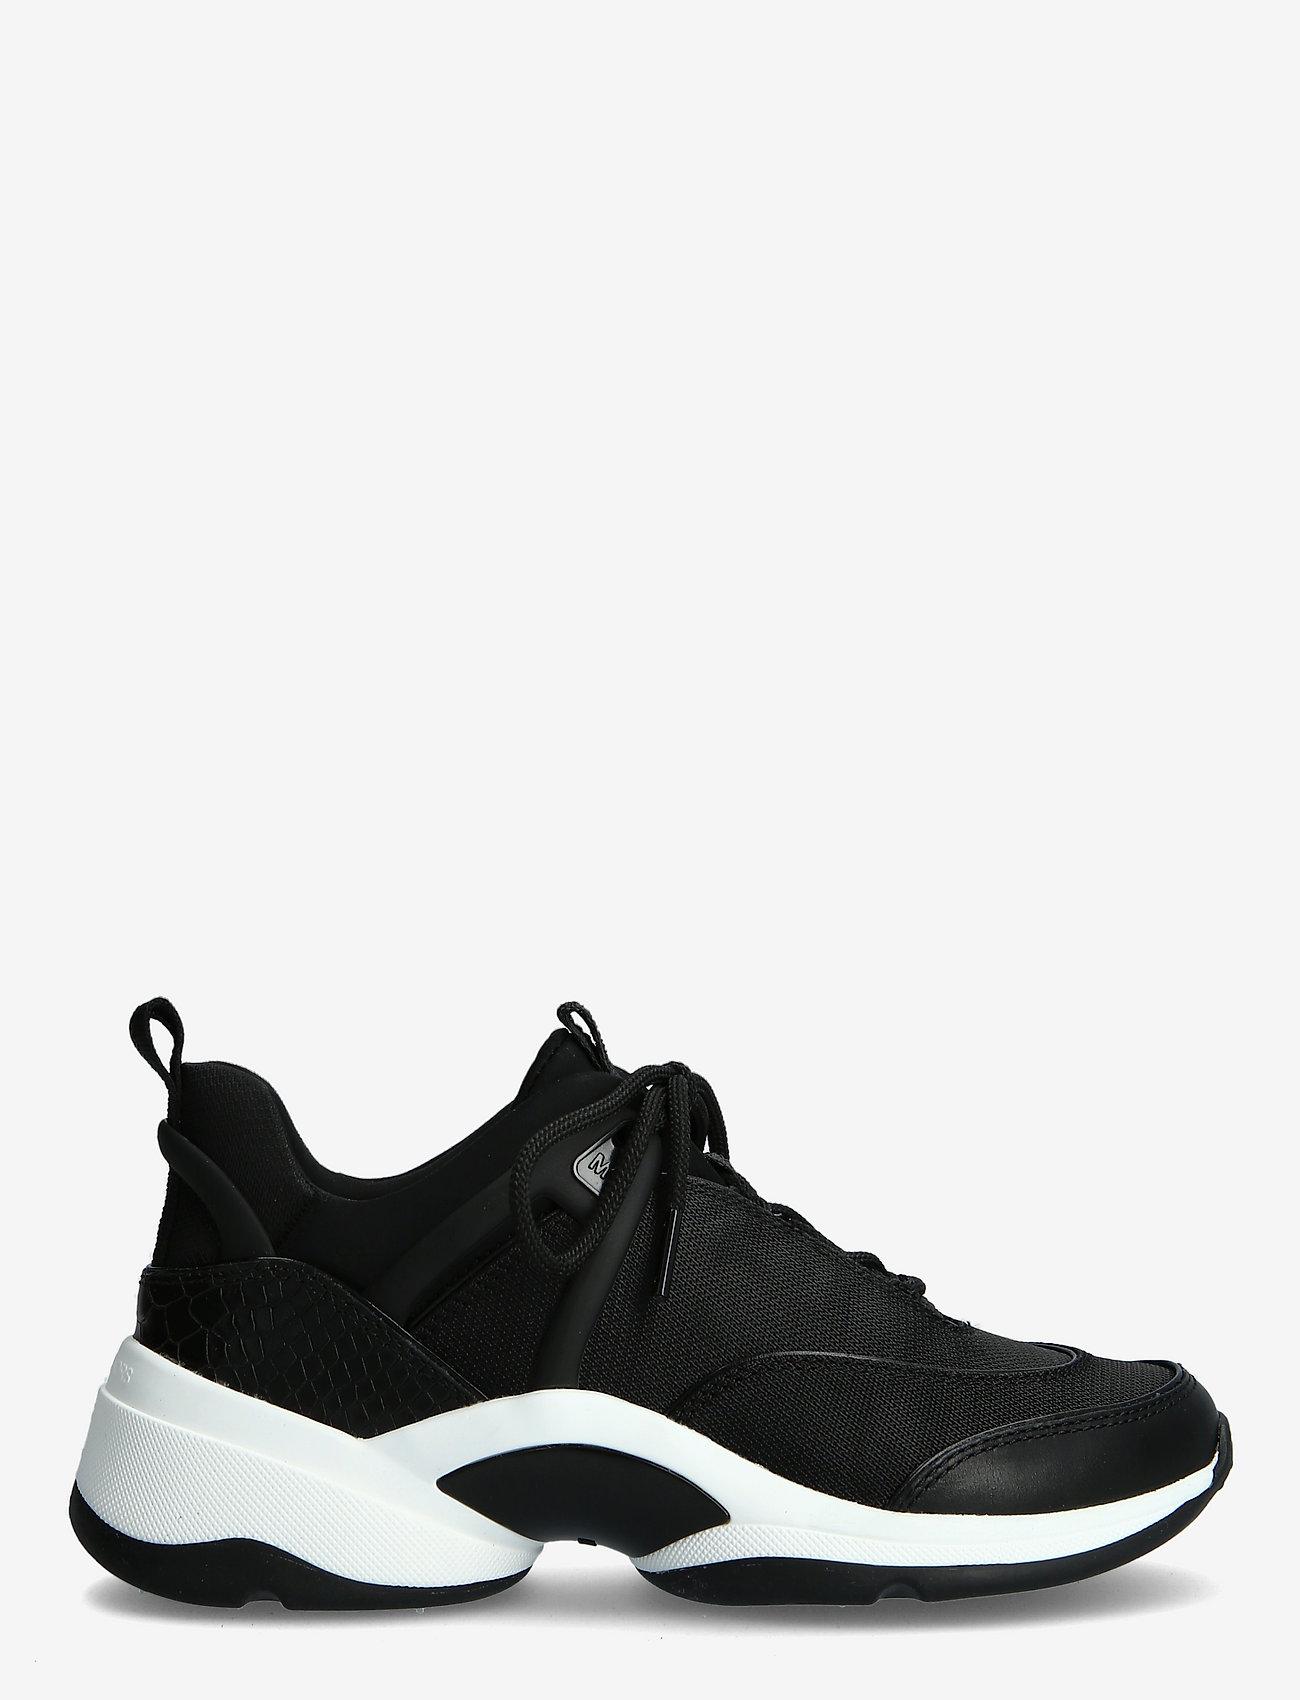 Michael Kors - SPARKS TRAINER - chunky sneakers - black - 1